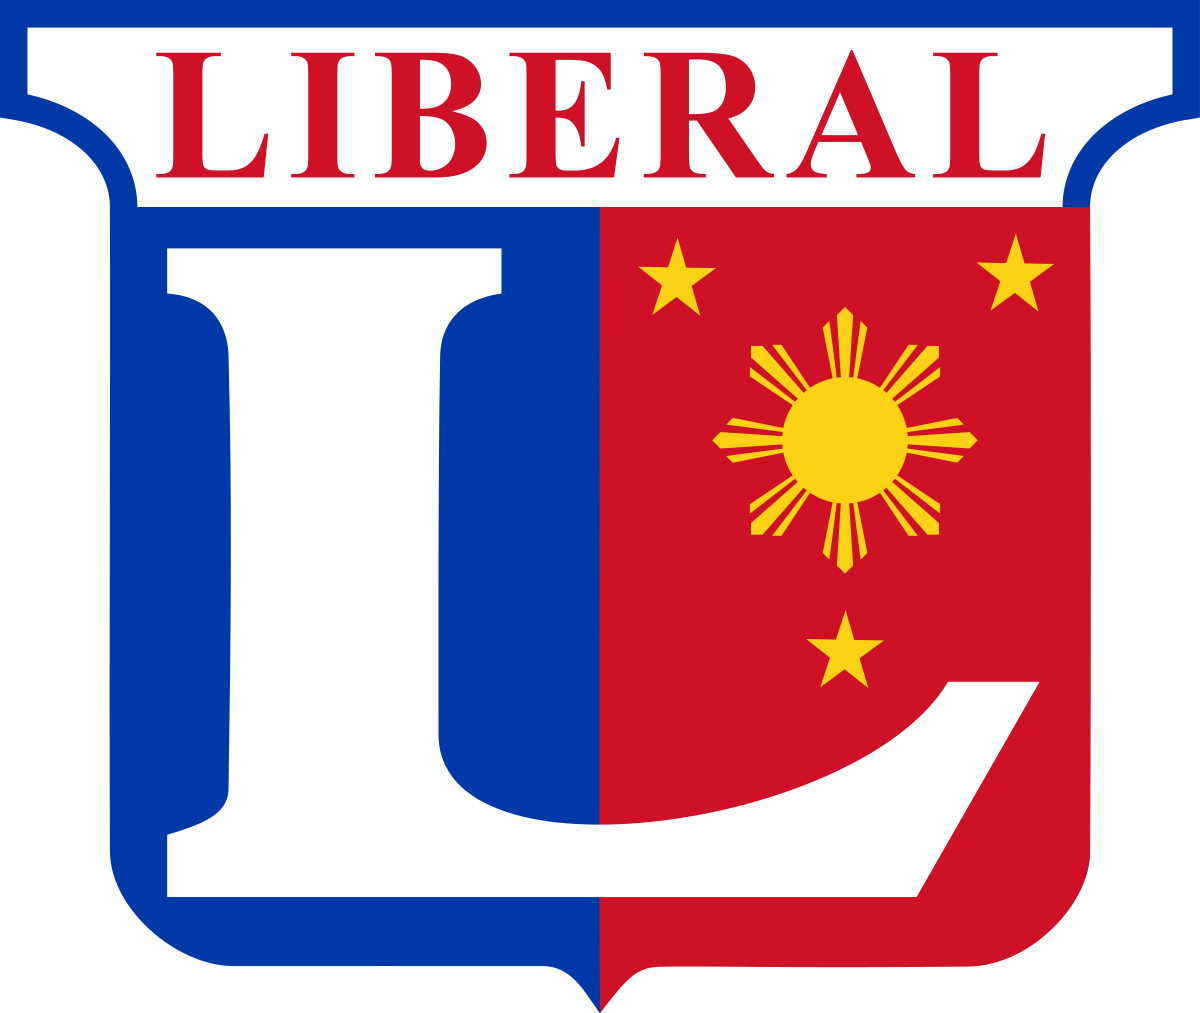 Nat l budget is. Democracy clipart liberal